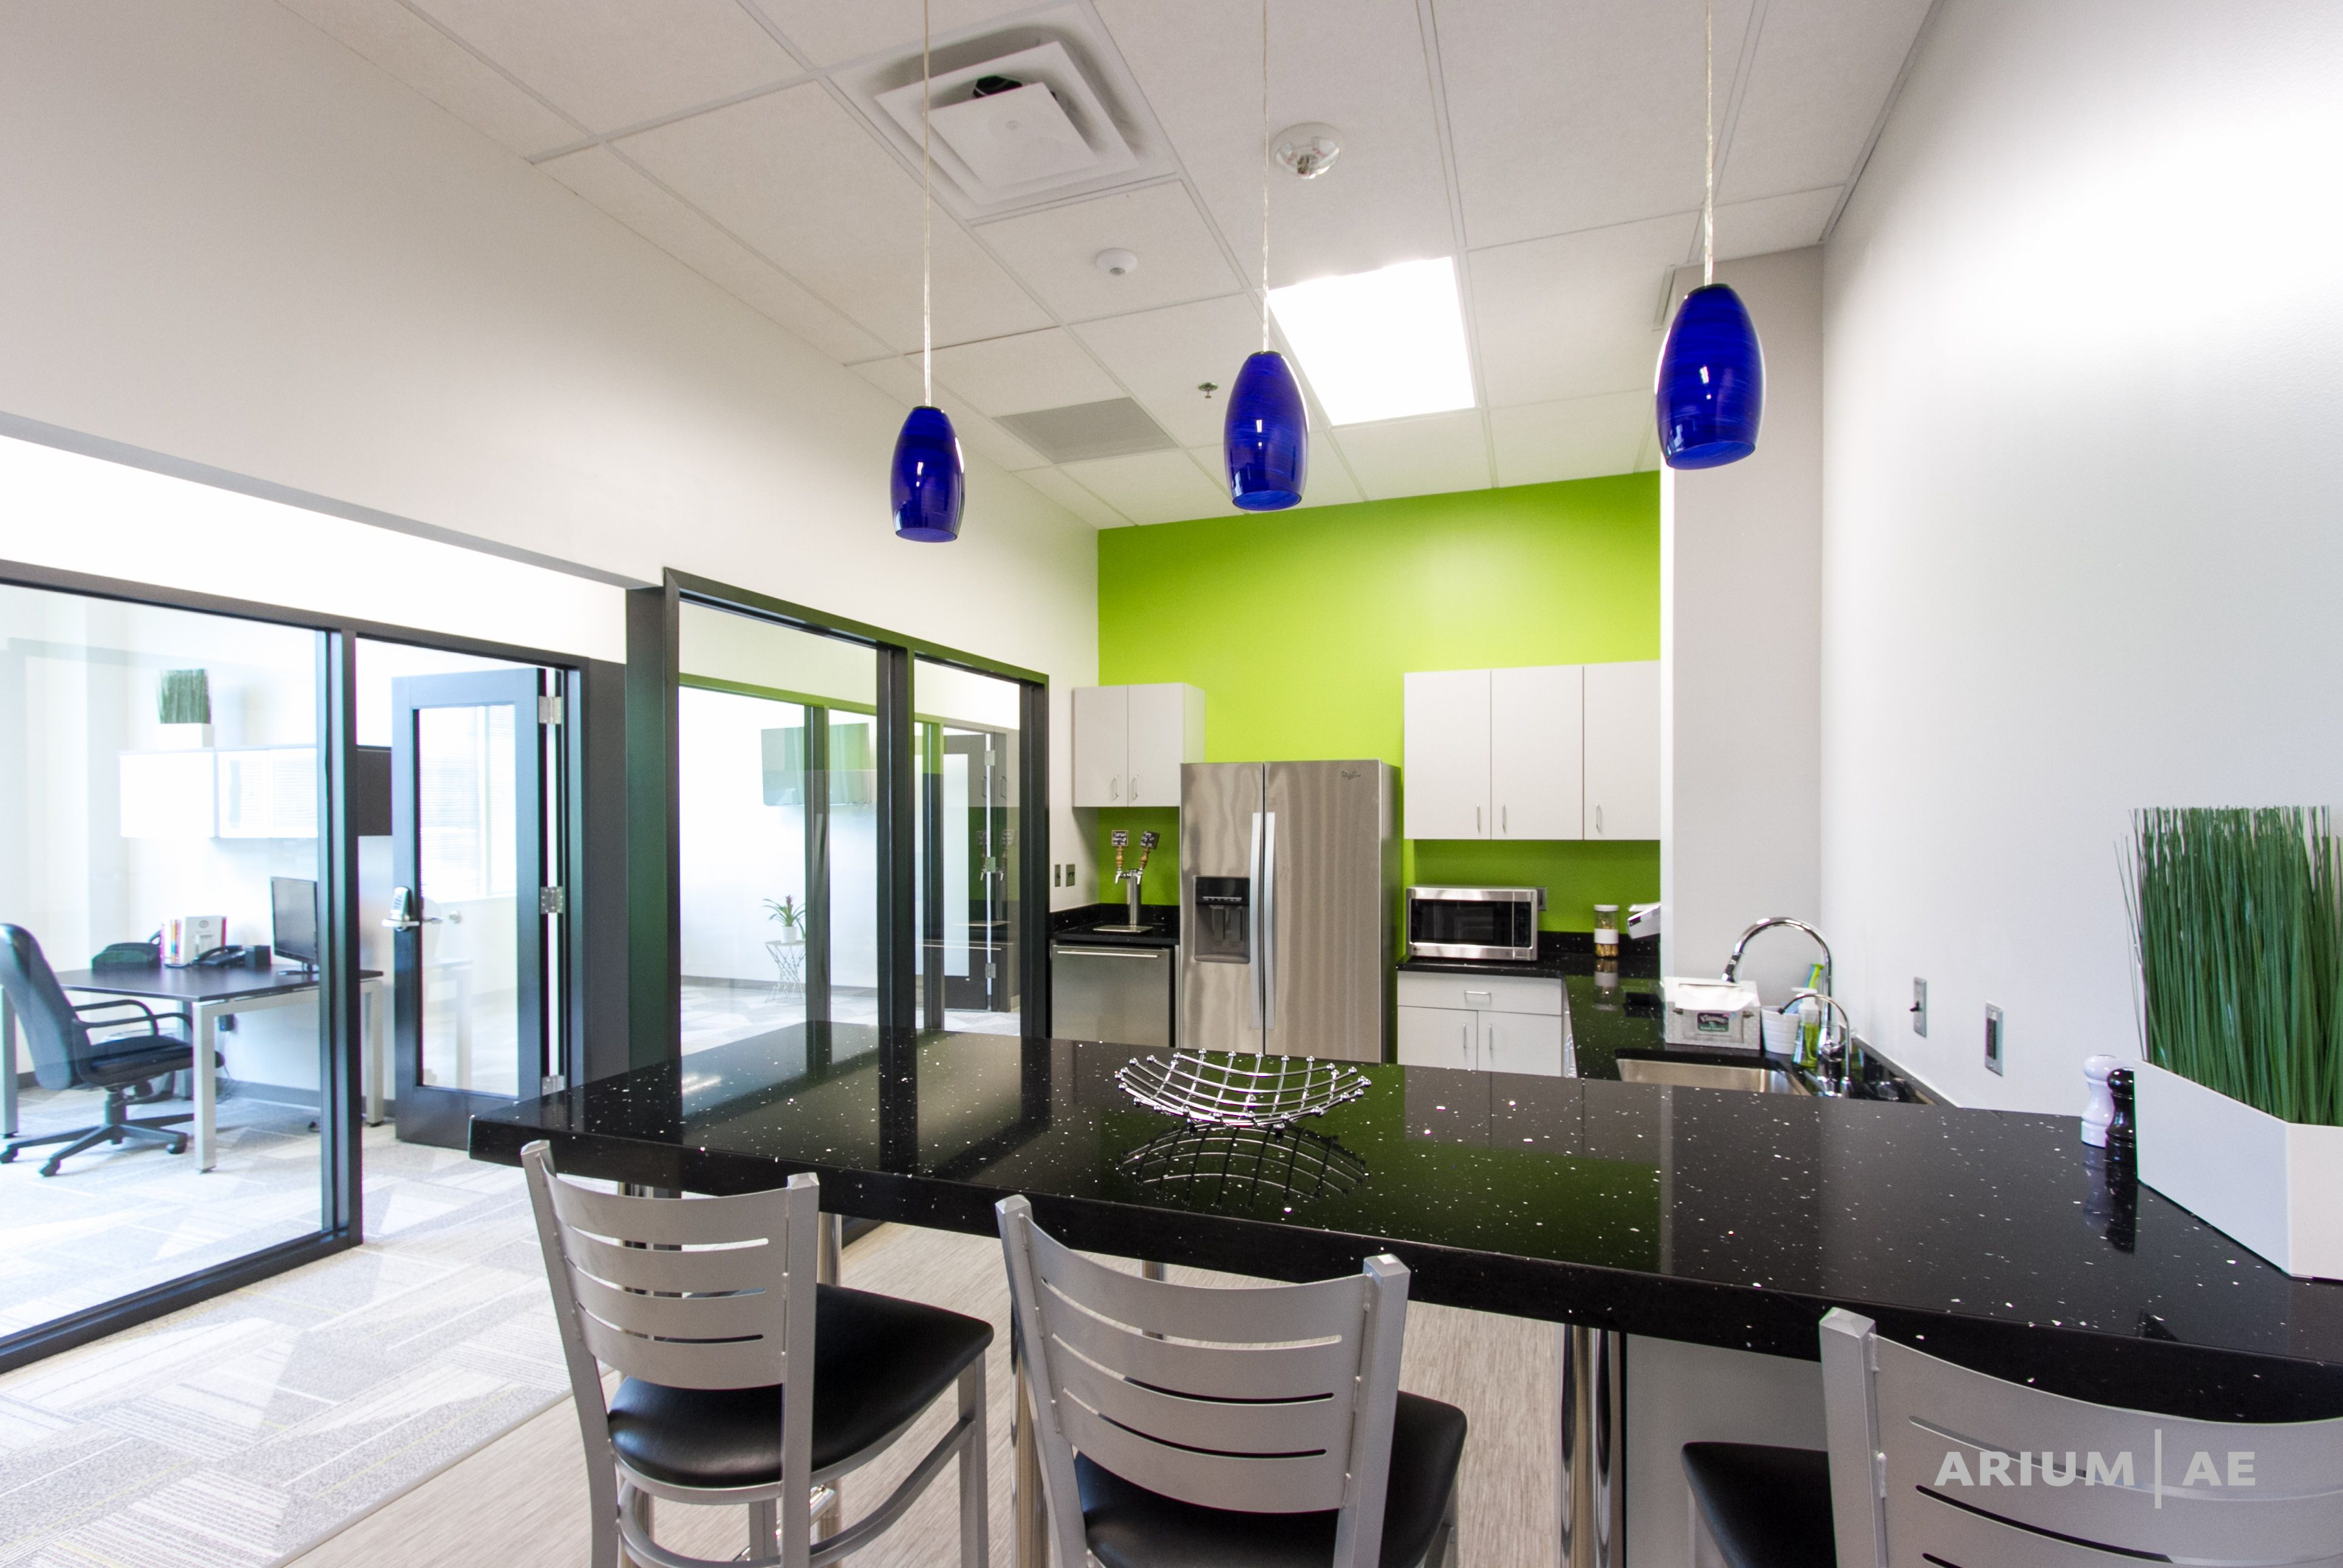 Break Area With Green Backsplash, Blue Pendant Lights, Black Stone  Countertops, And Black Framed Glass Walls